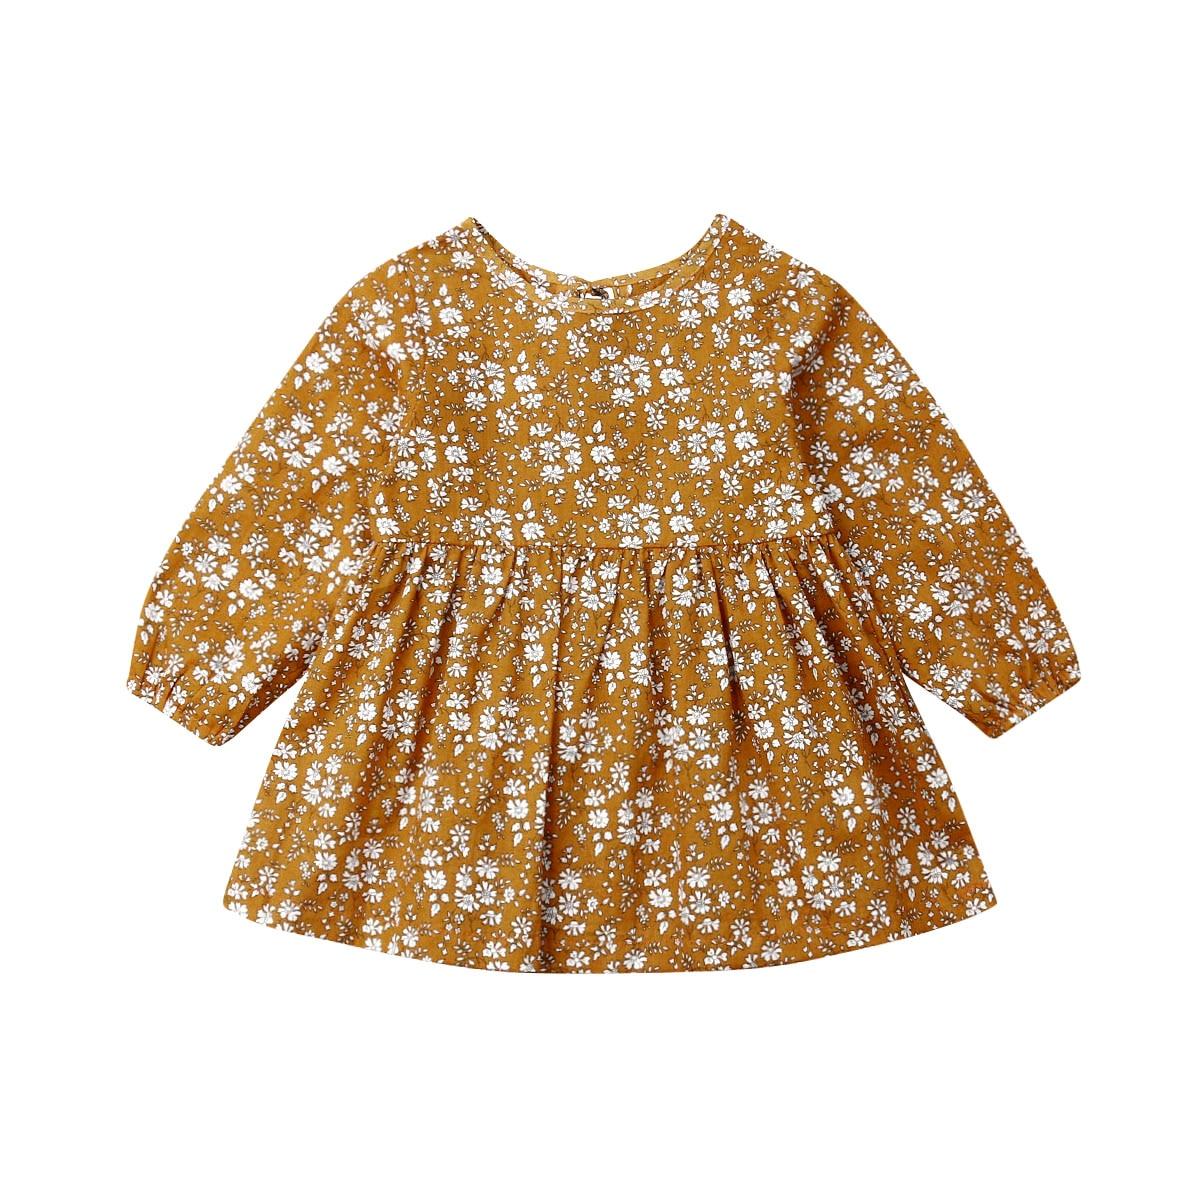 1-4T 幼児キッズベビーガール花服長袖フラワープリントドレスエレガントなかわいいラブリースウィート衣装